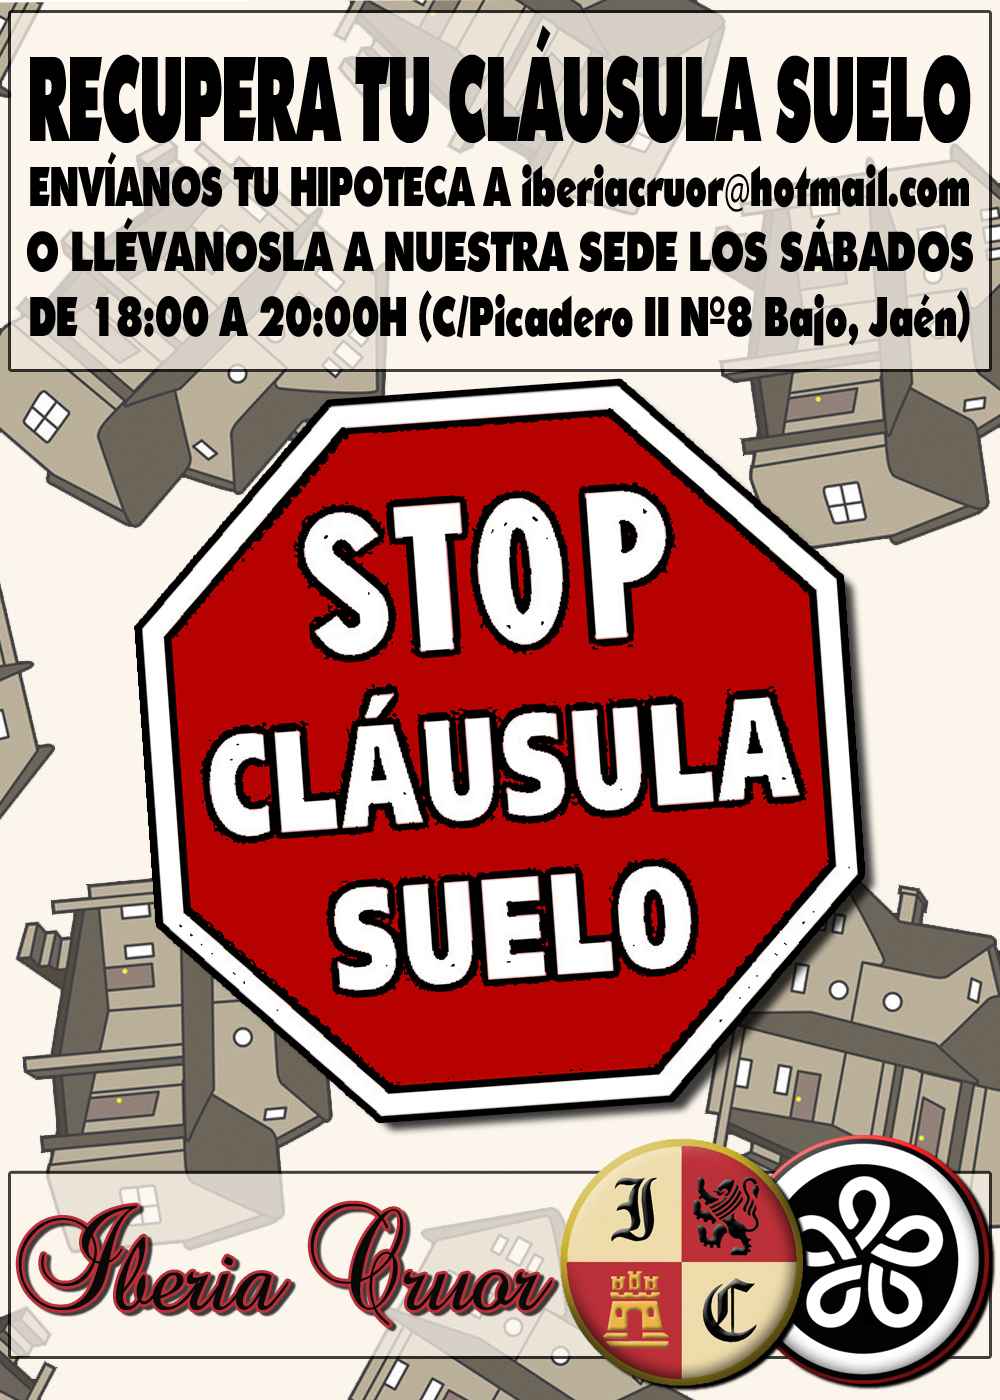 Asociaci n iberia cruor recupera tu cl usula suelo for Clausula suelo hipoteca